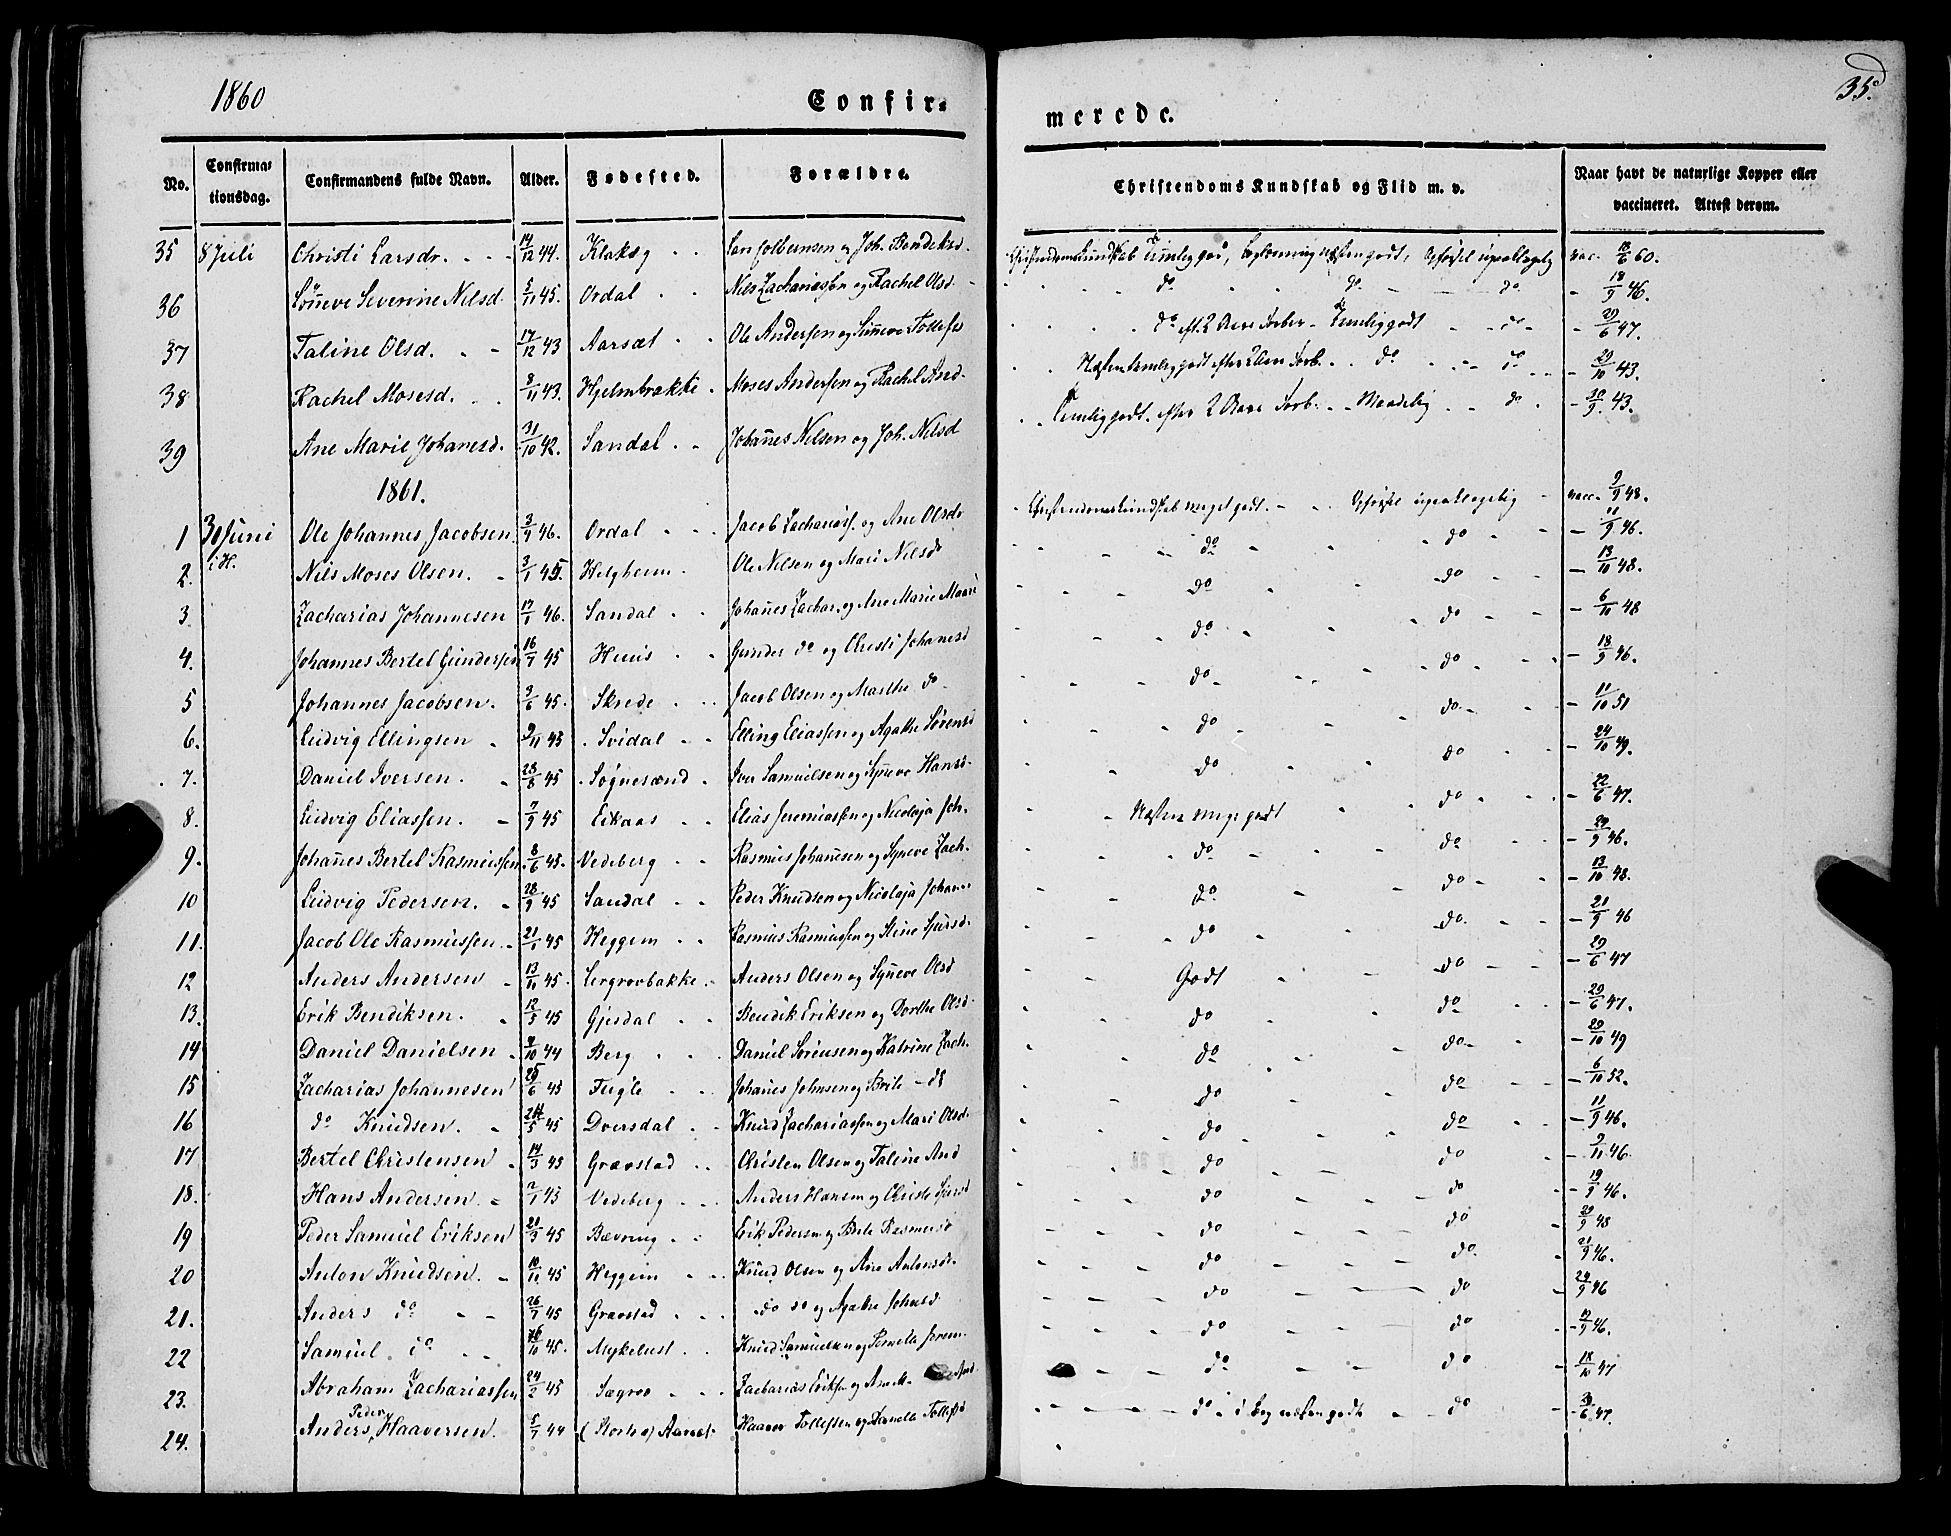 SAB, Jølster sokneprestembete, H/Haa/Haaa/L0010: Parish register (official) no. A 10, 1847-1865, p. 35